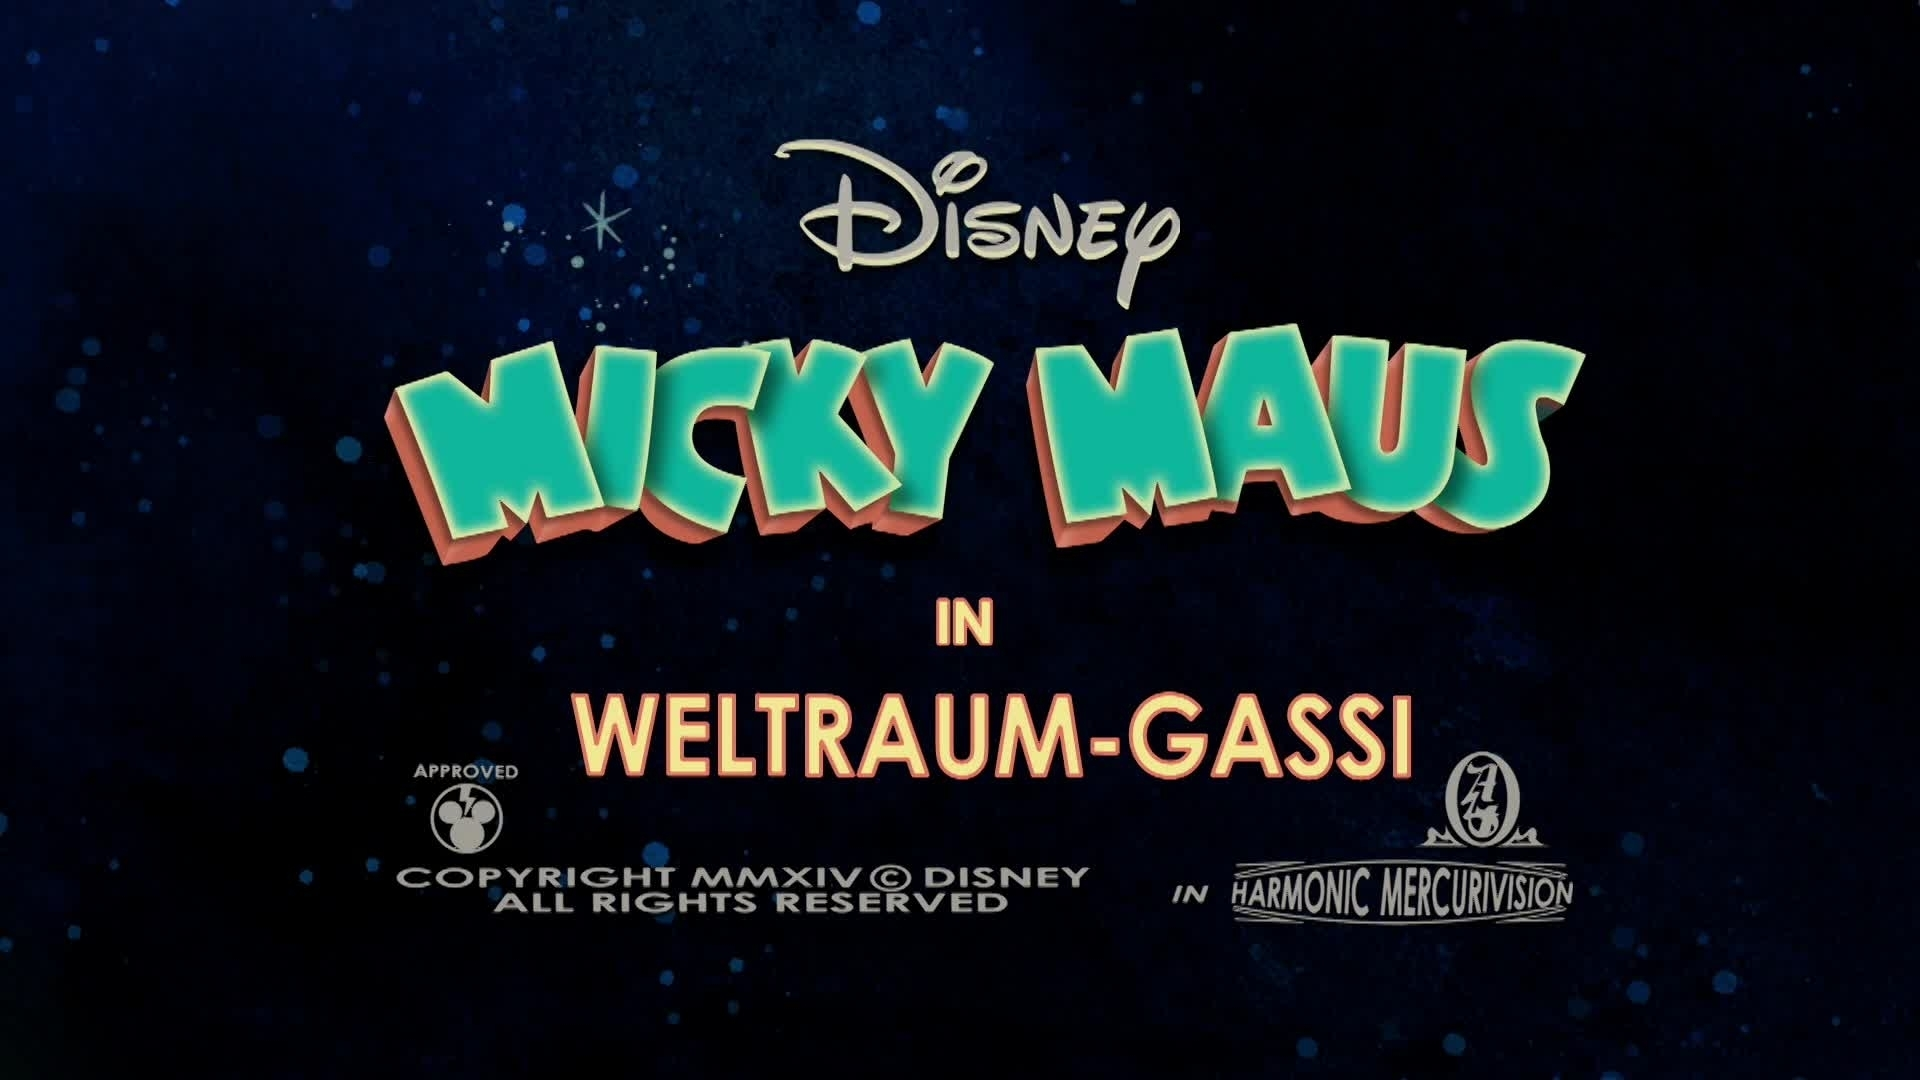 Micky Short: Weltraum Gassi